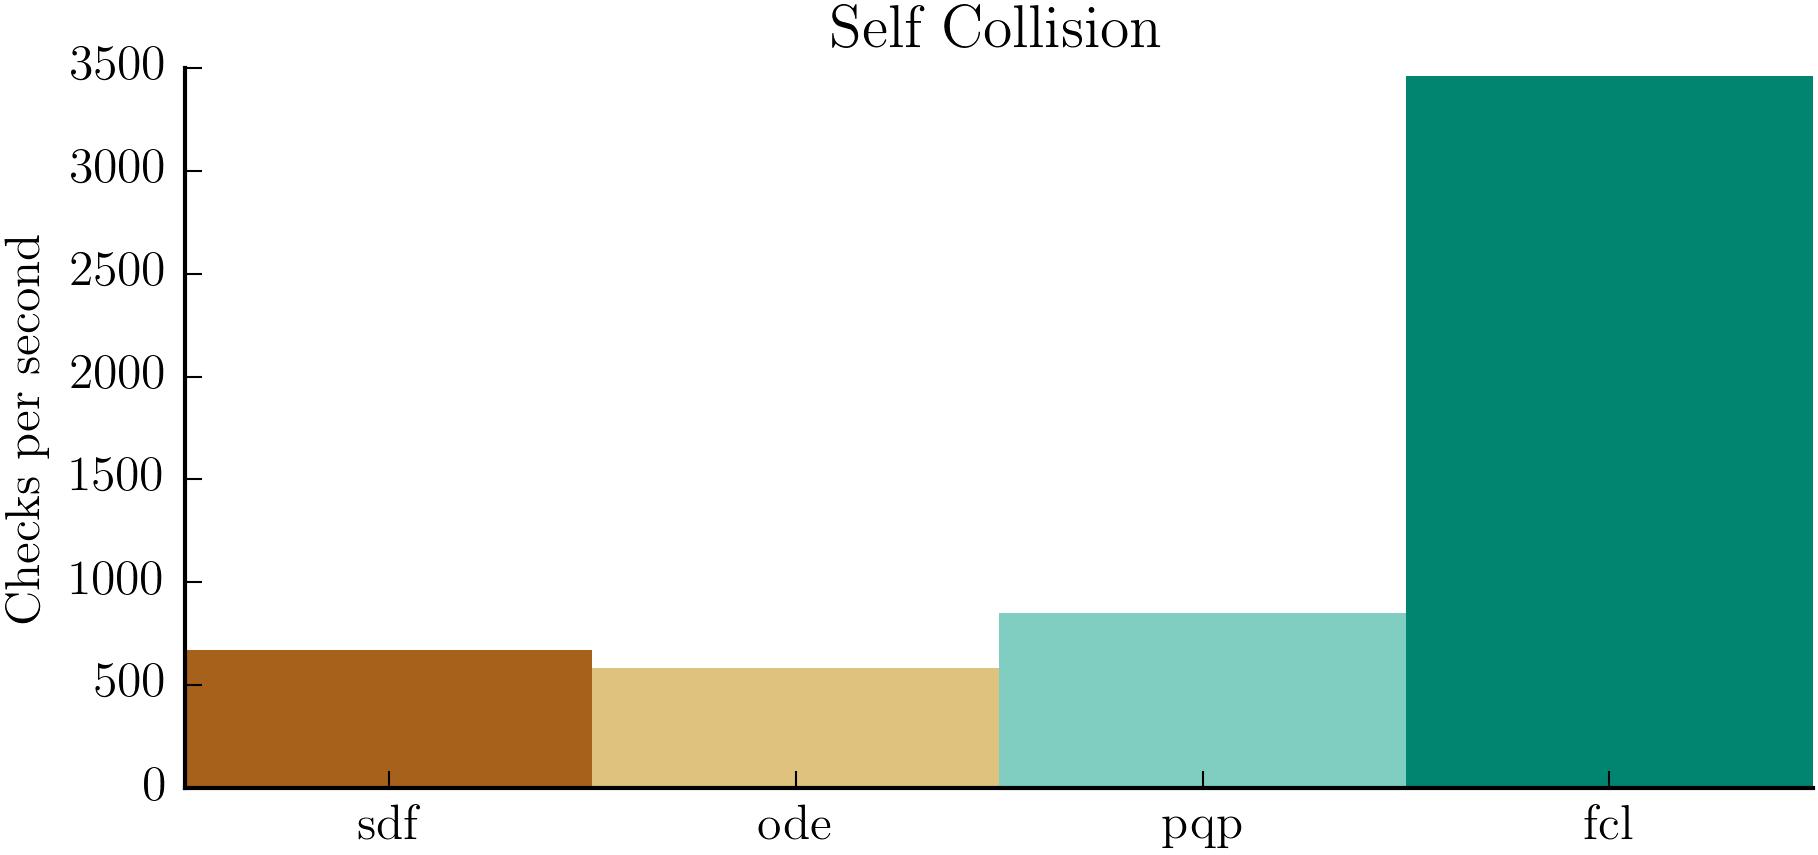 self_collision_results